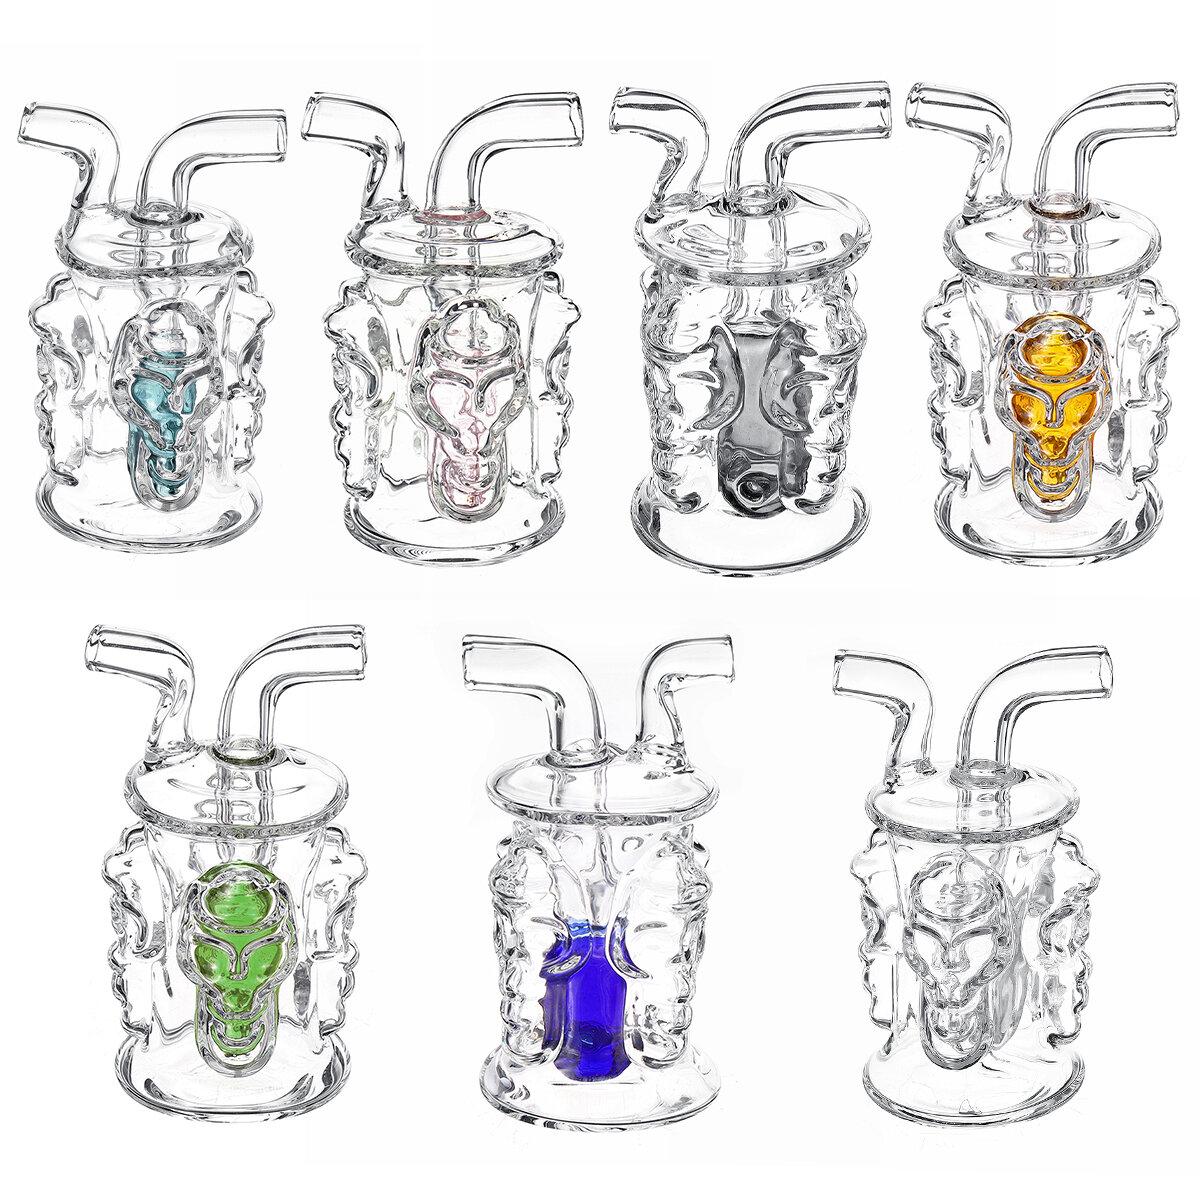 Novos Tubos de vidro H ookah Craft Mini Quatro lados de quatro crânios Crânio de vidro pequeno H ookah